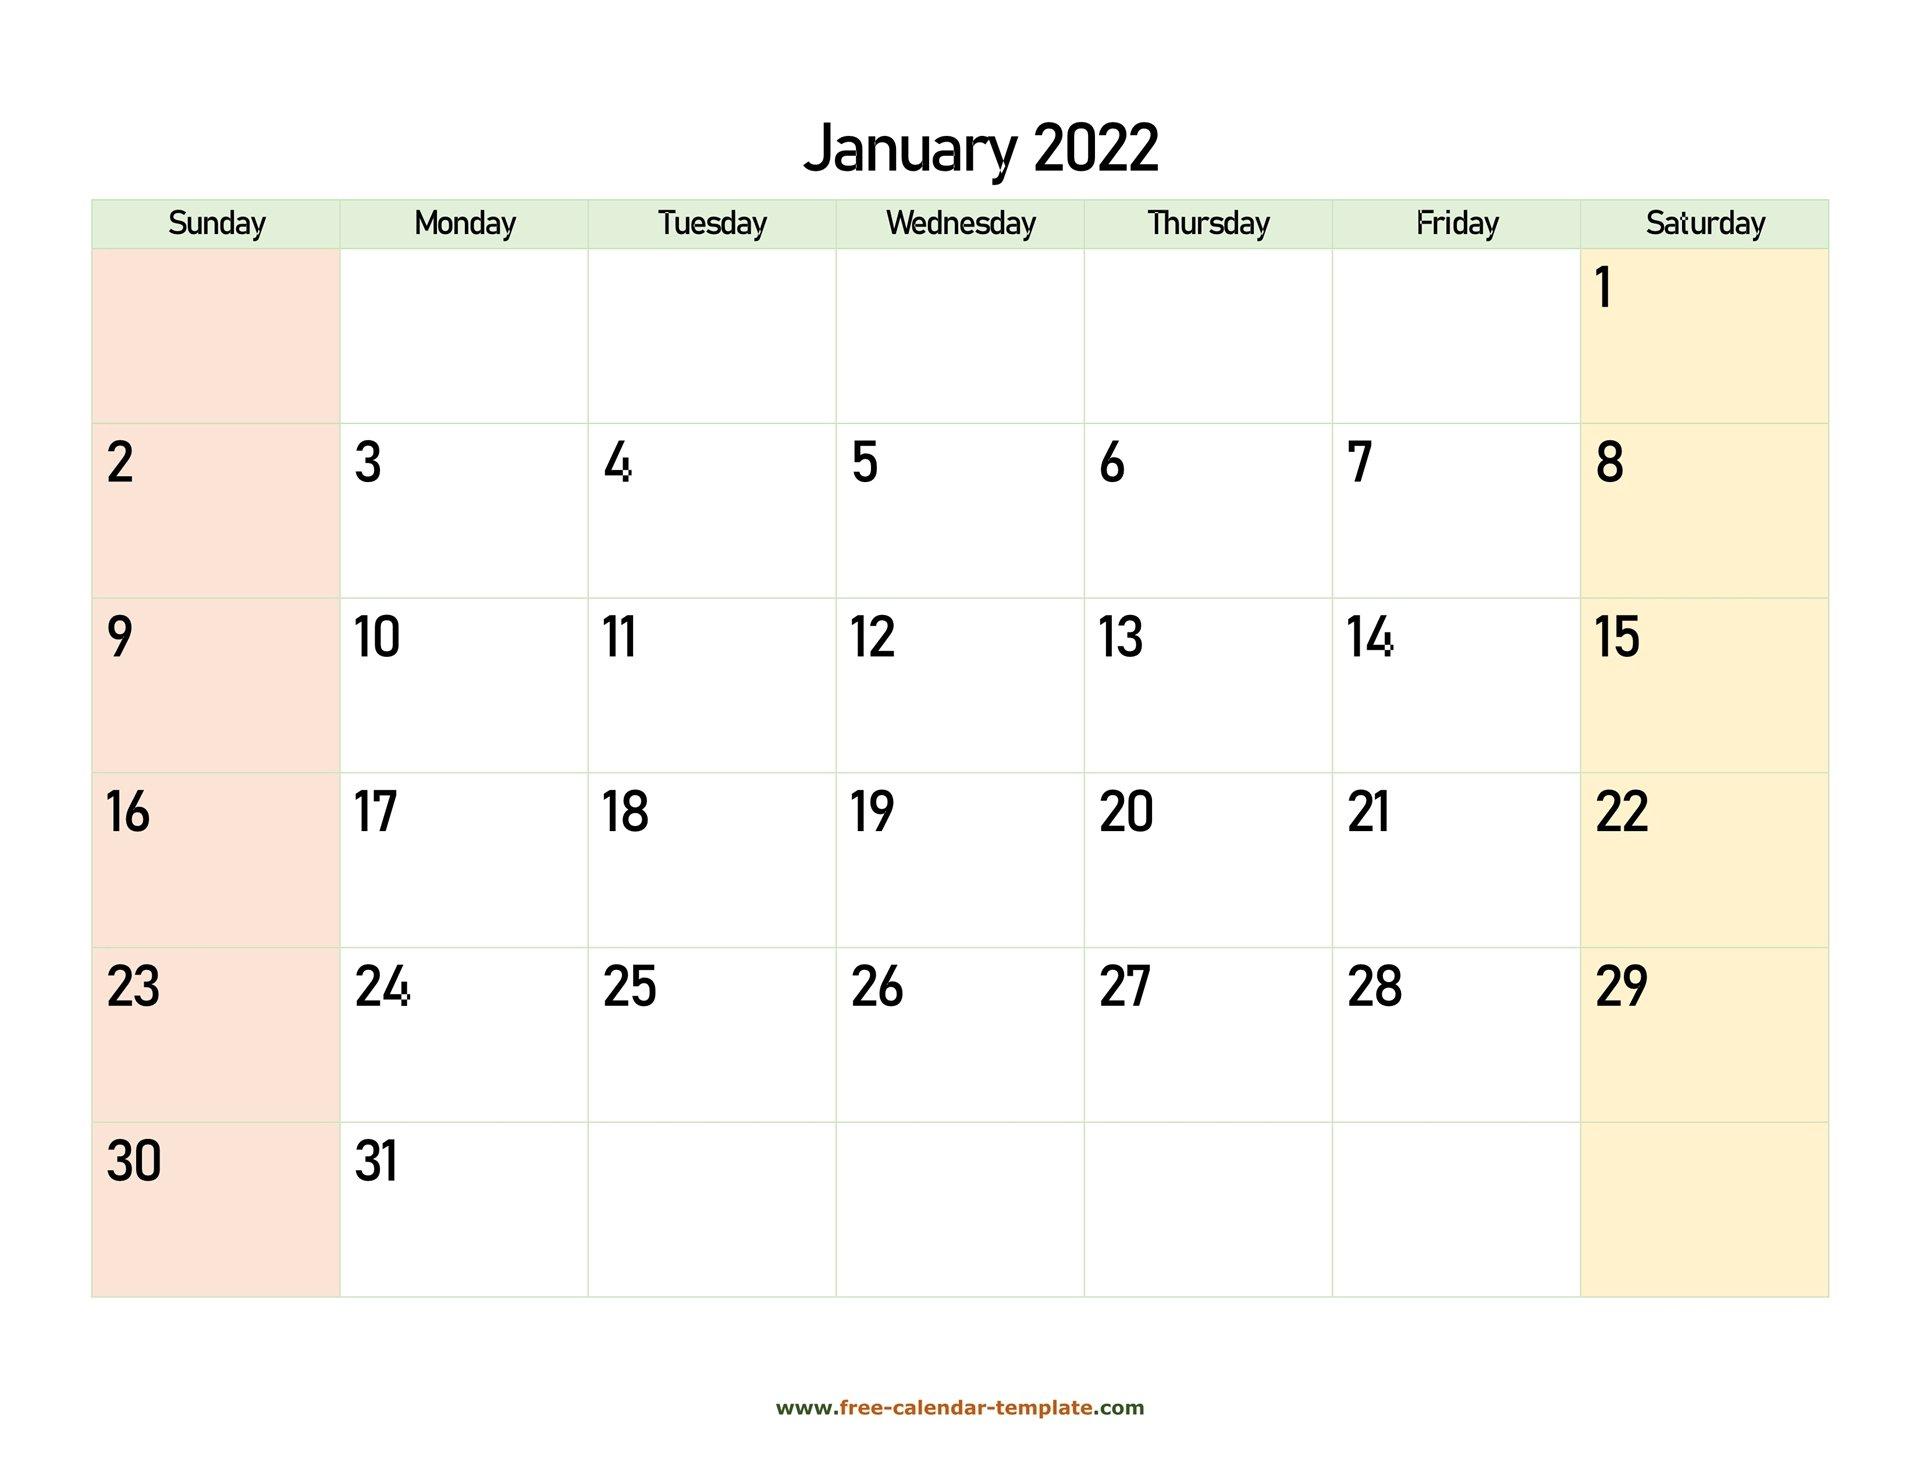 January 2022 Free Calendar Tempplate   Free-Calendar within Free Printable Printable Pdf January 2022 Calendar Photo